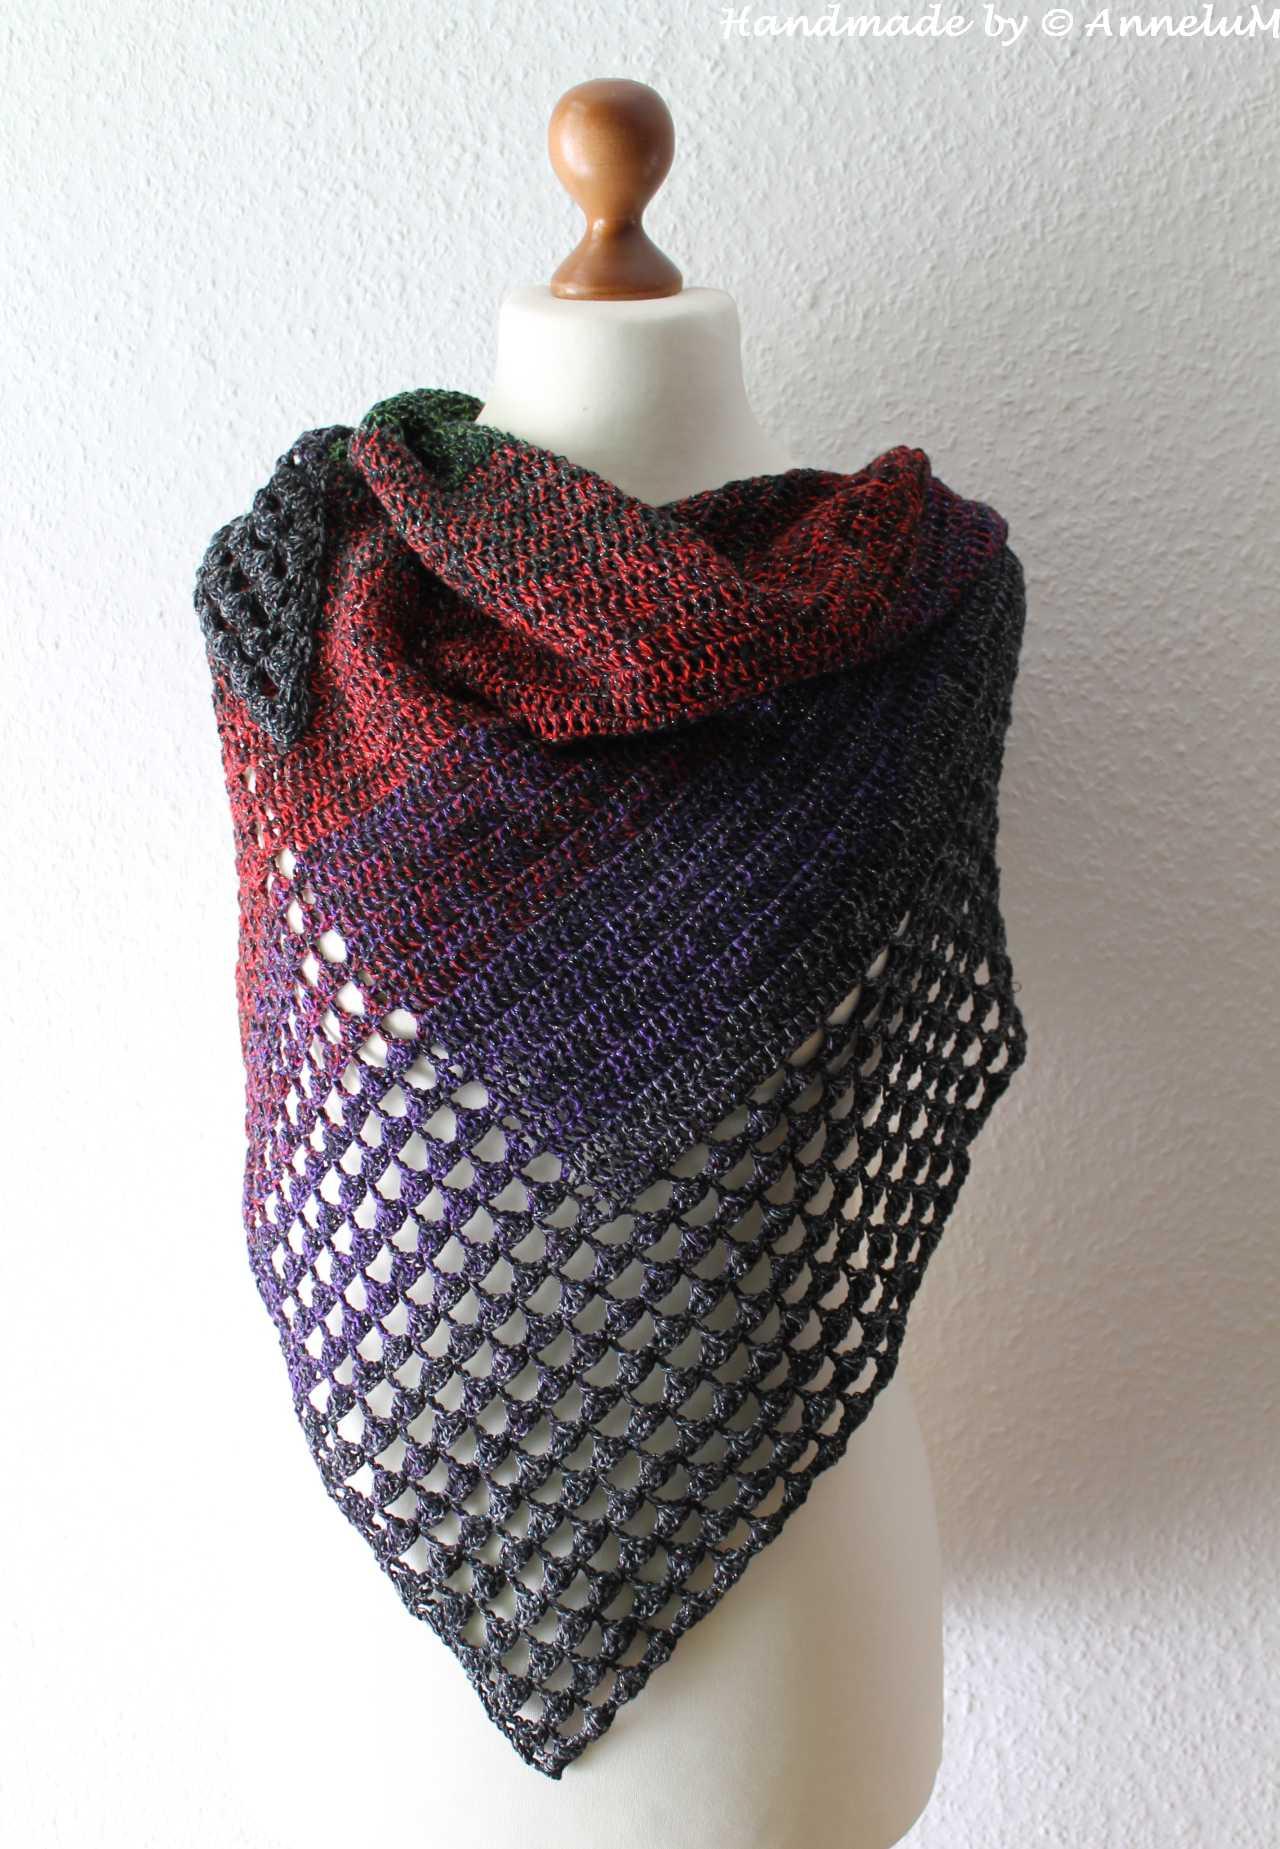 Falas - Handmade by AnneluM